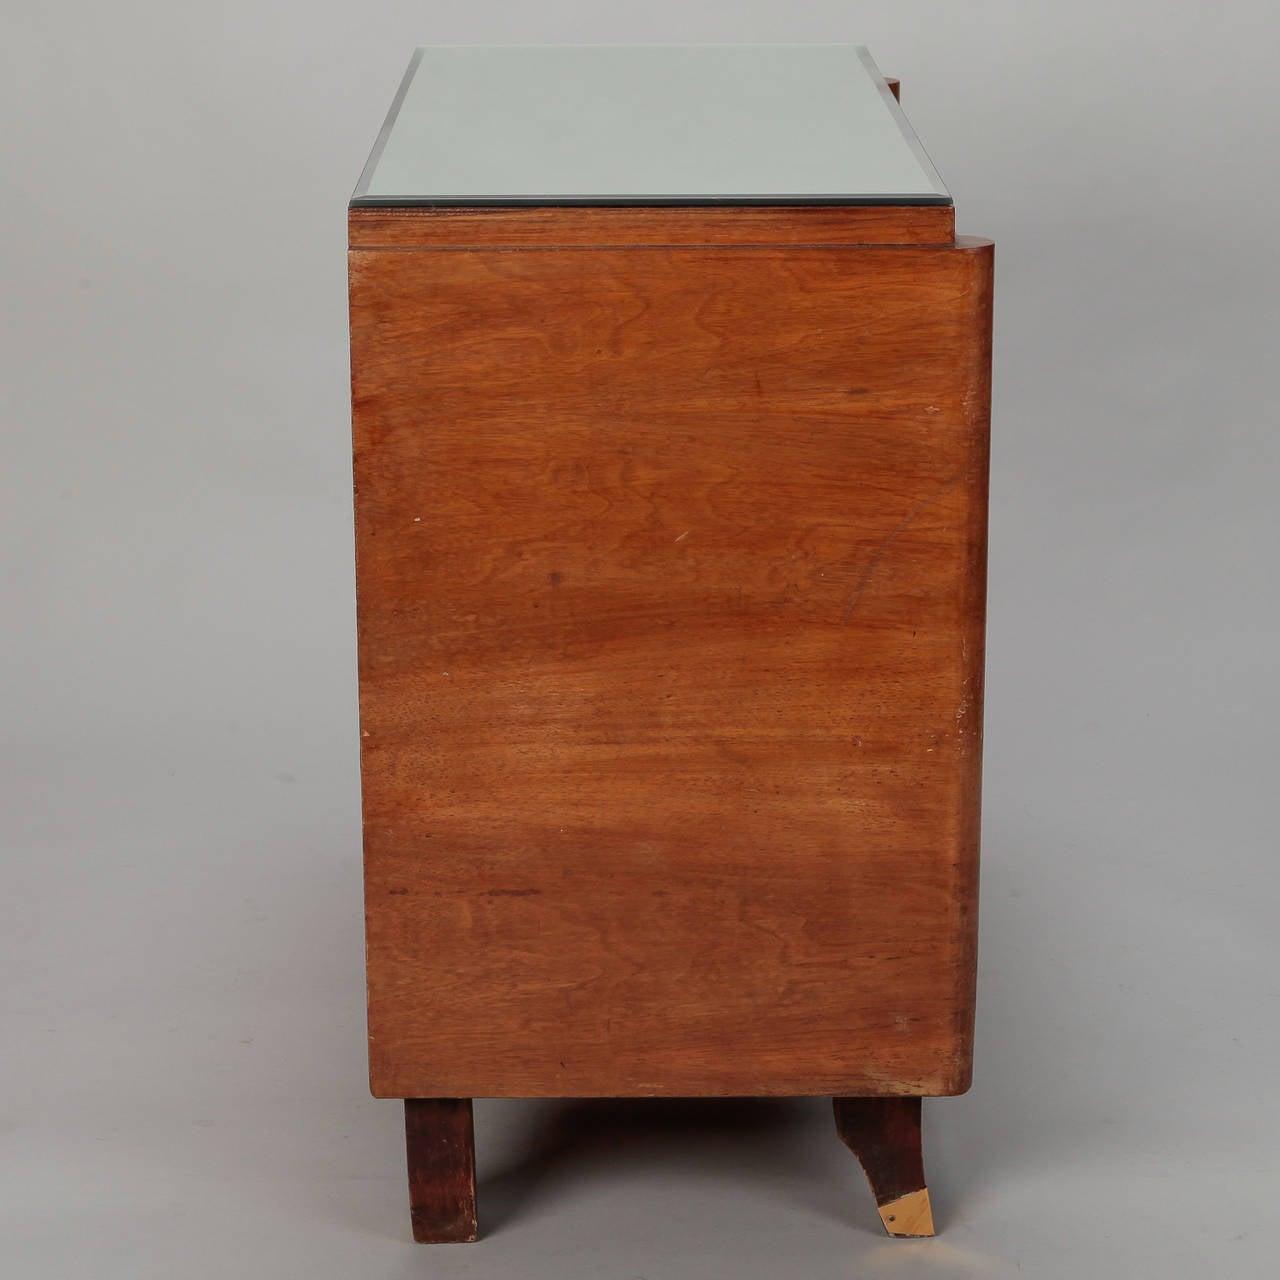 Mid-20th Century Art Deco Era Mirrored Walnut Chest of Drawers